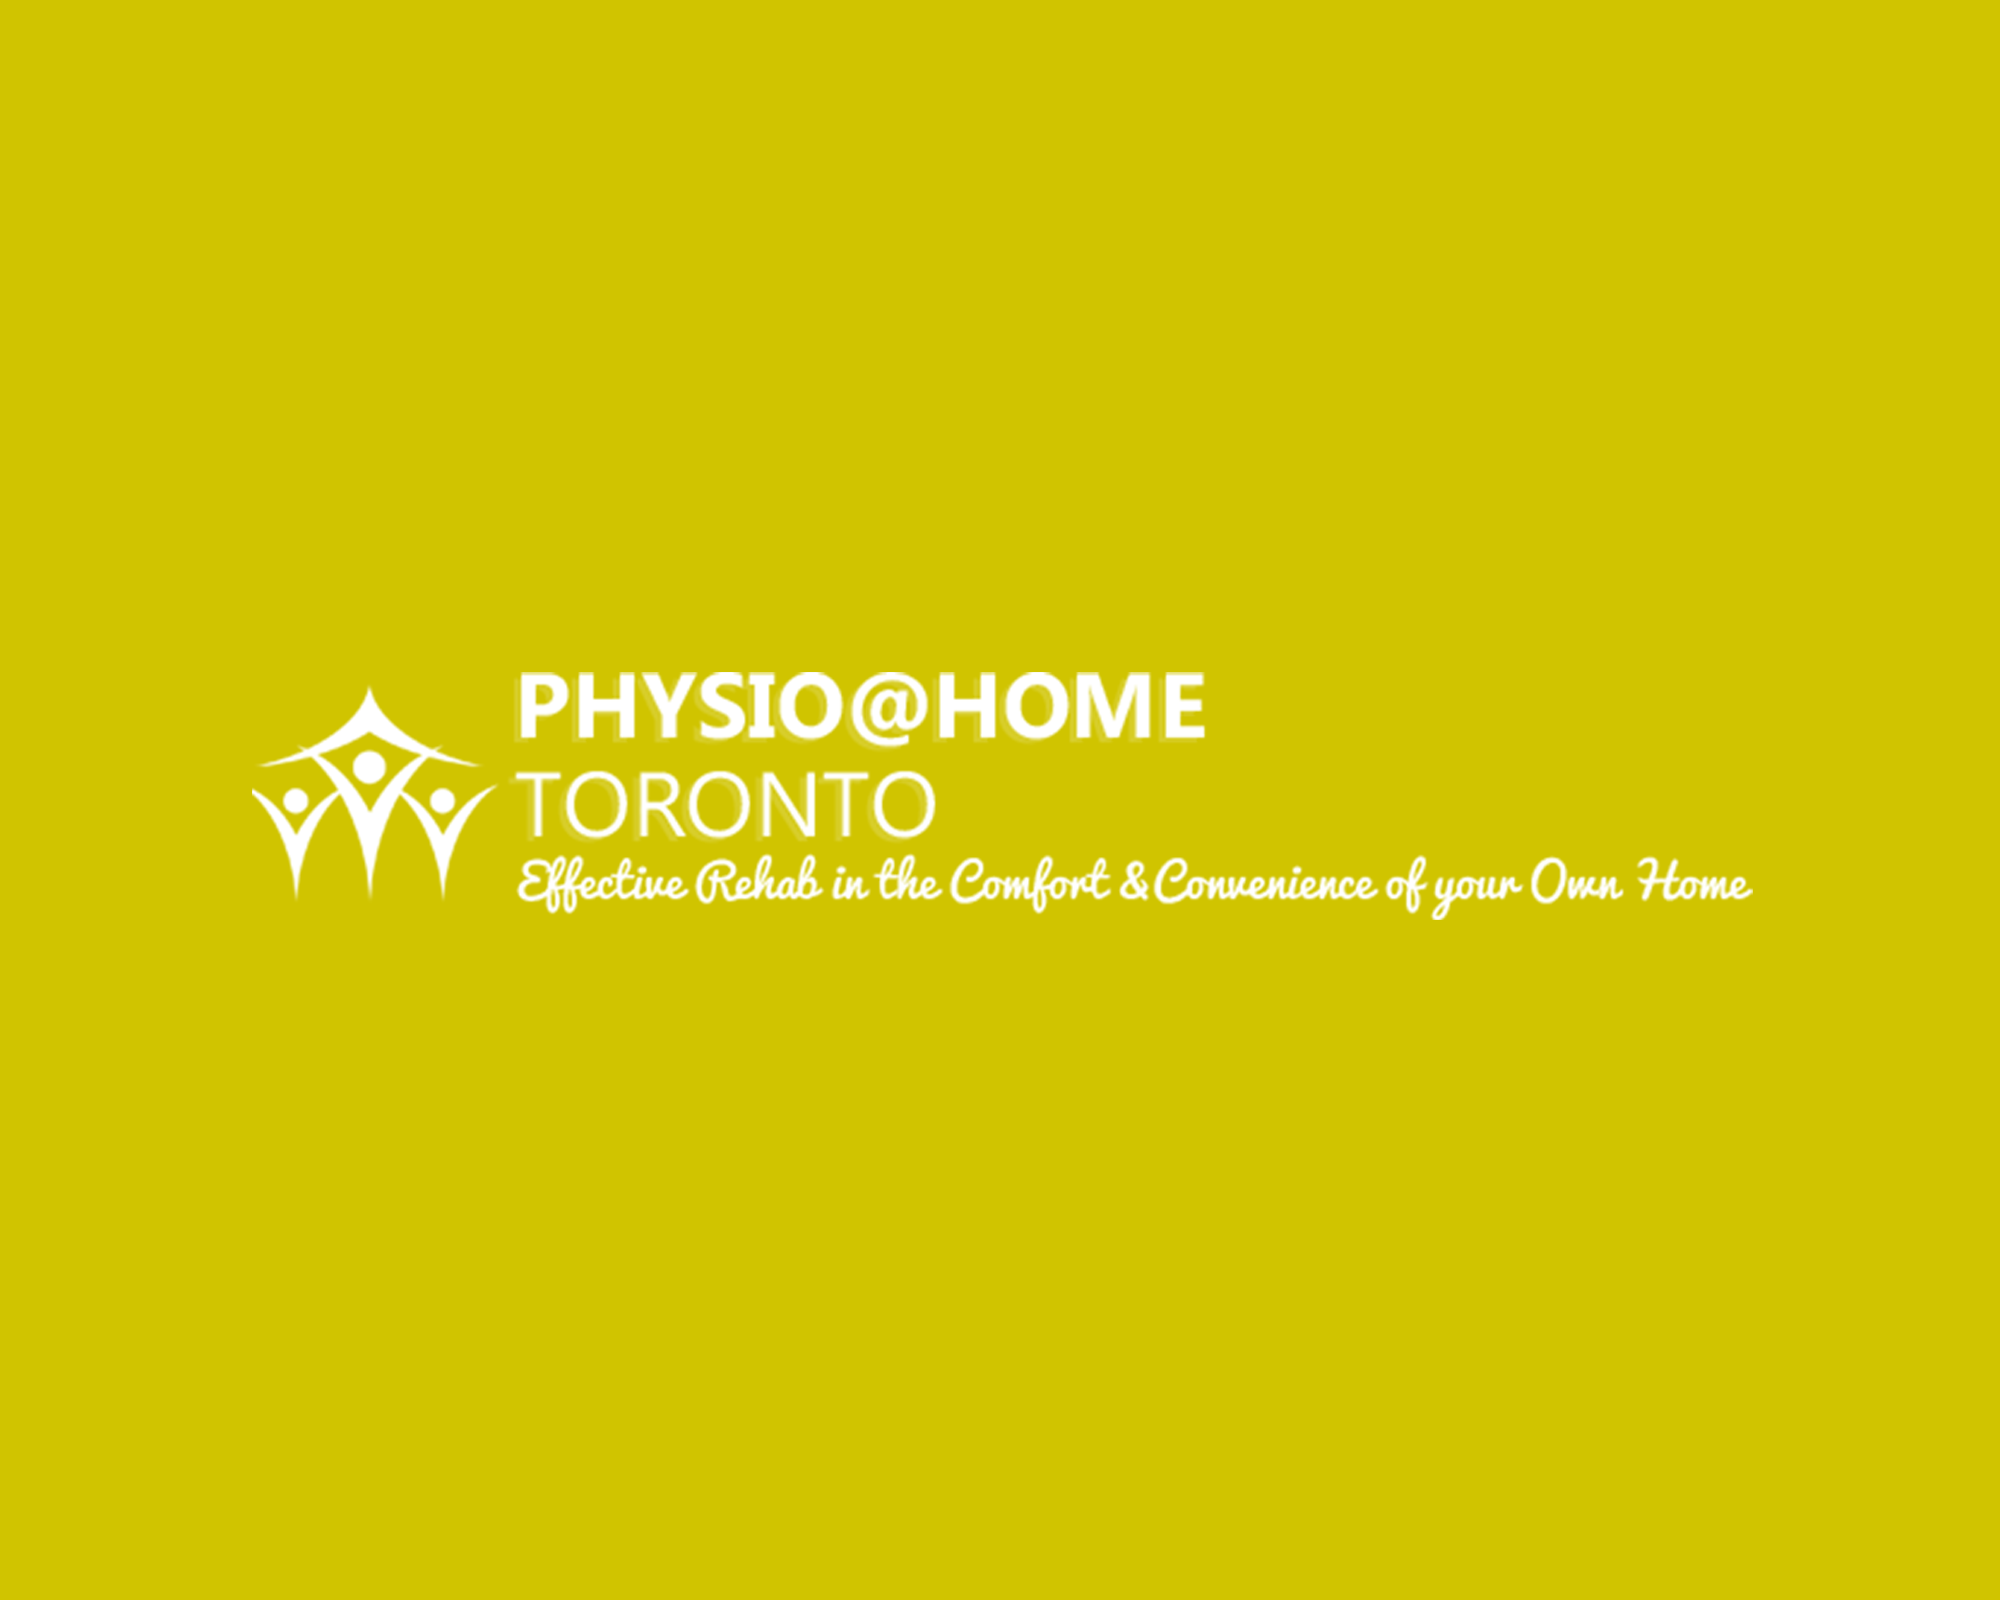 physio at home toronto Logo